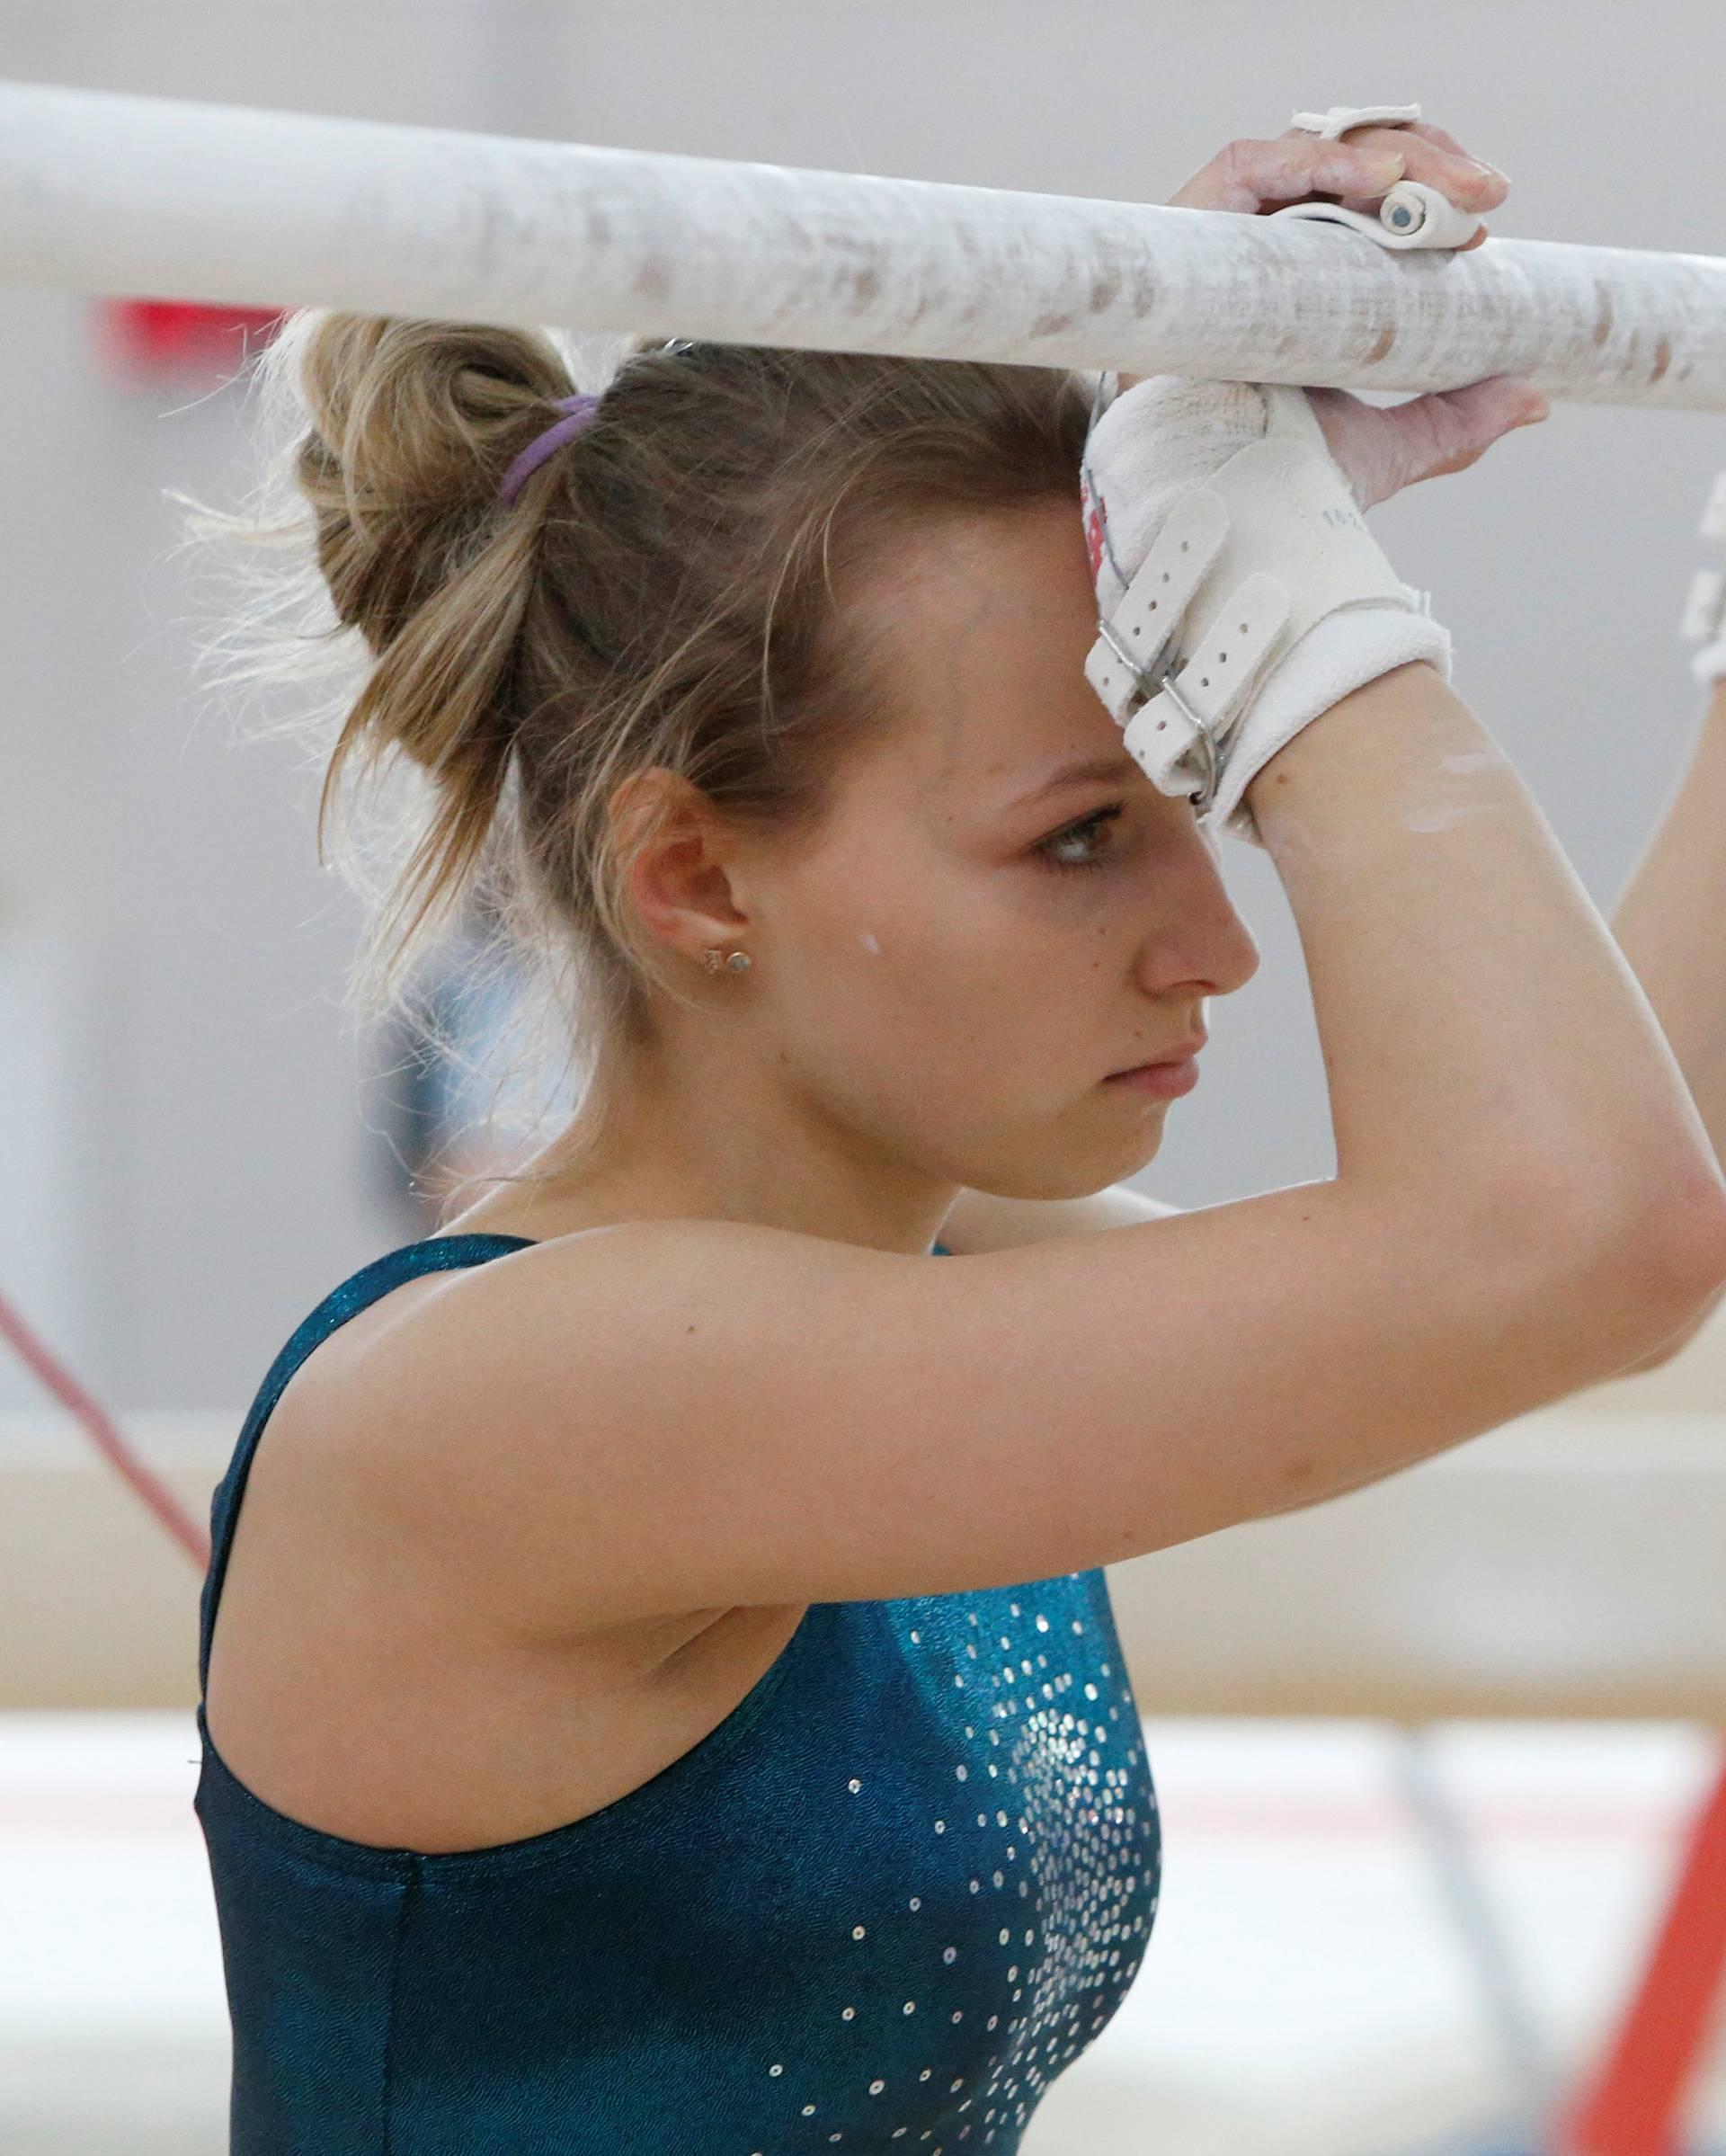 Member of women's gymnastics Russian Olympic team Spiridonova attends training session at Ozero Krugloe training centre outside Moscow